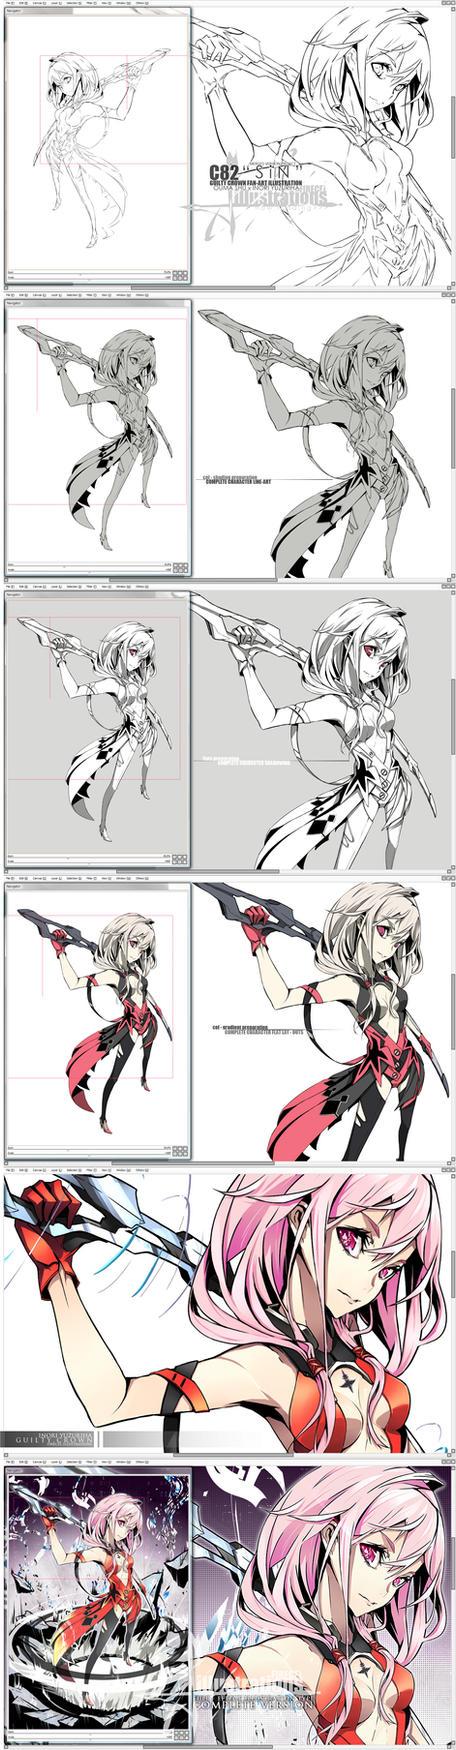 DS - Inori x Shu - C82 Illustration by Firecel